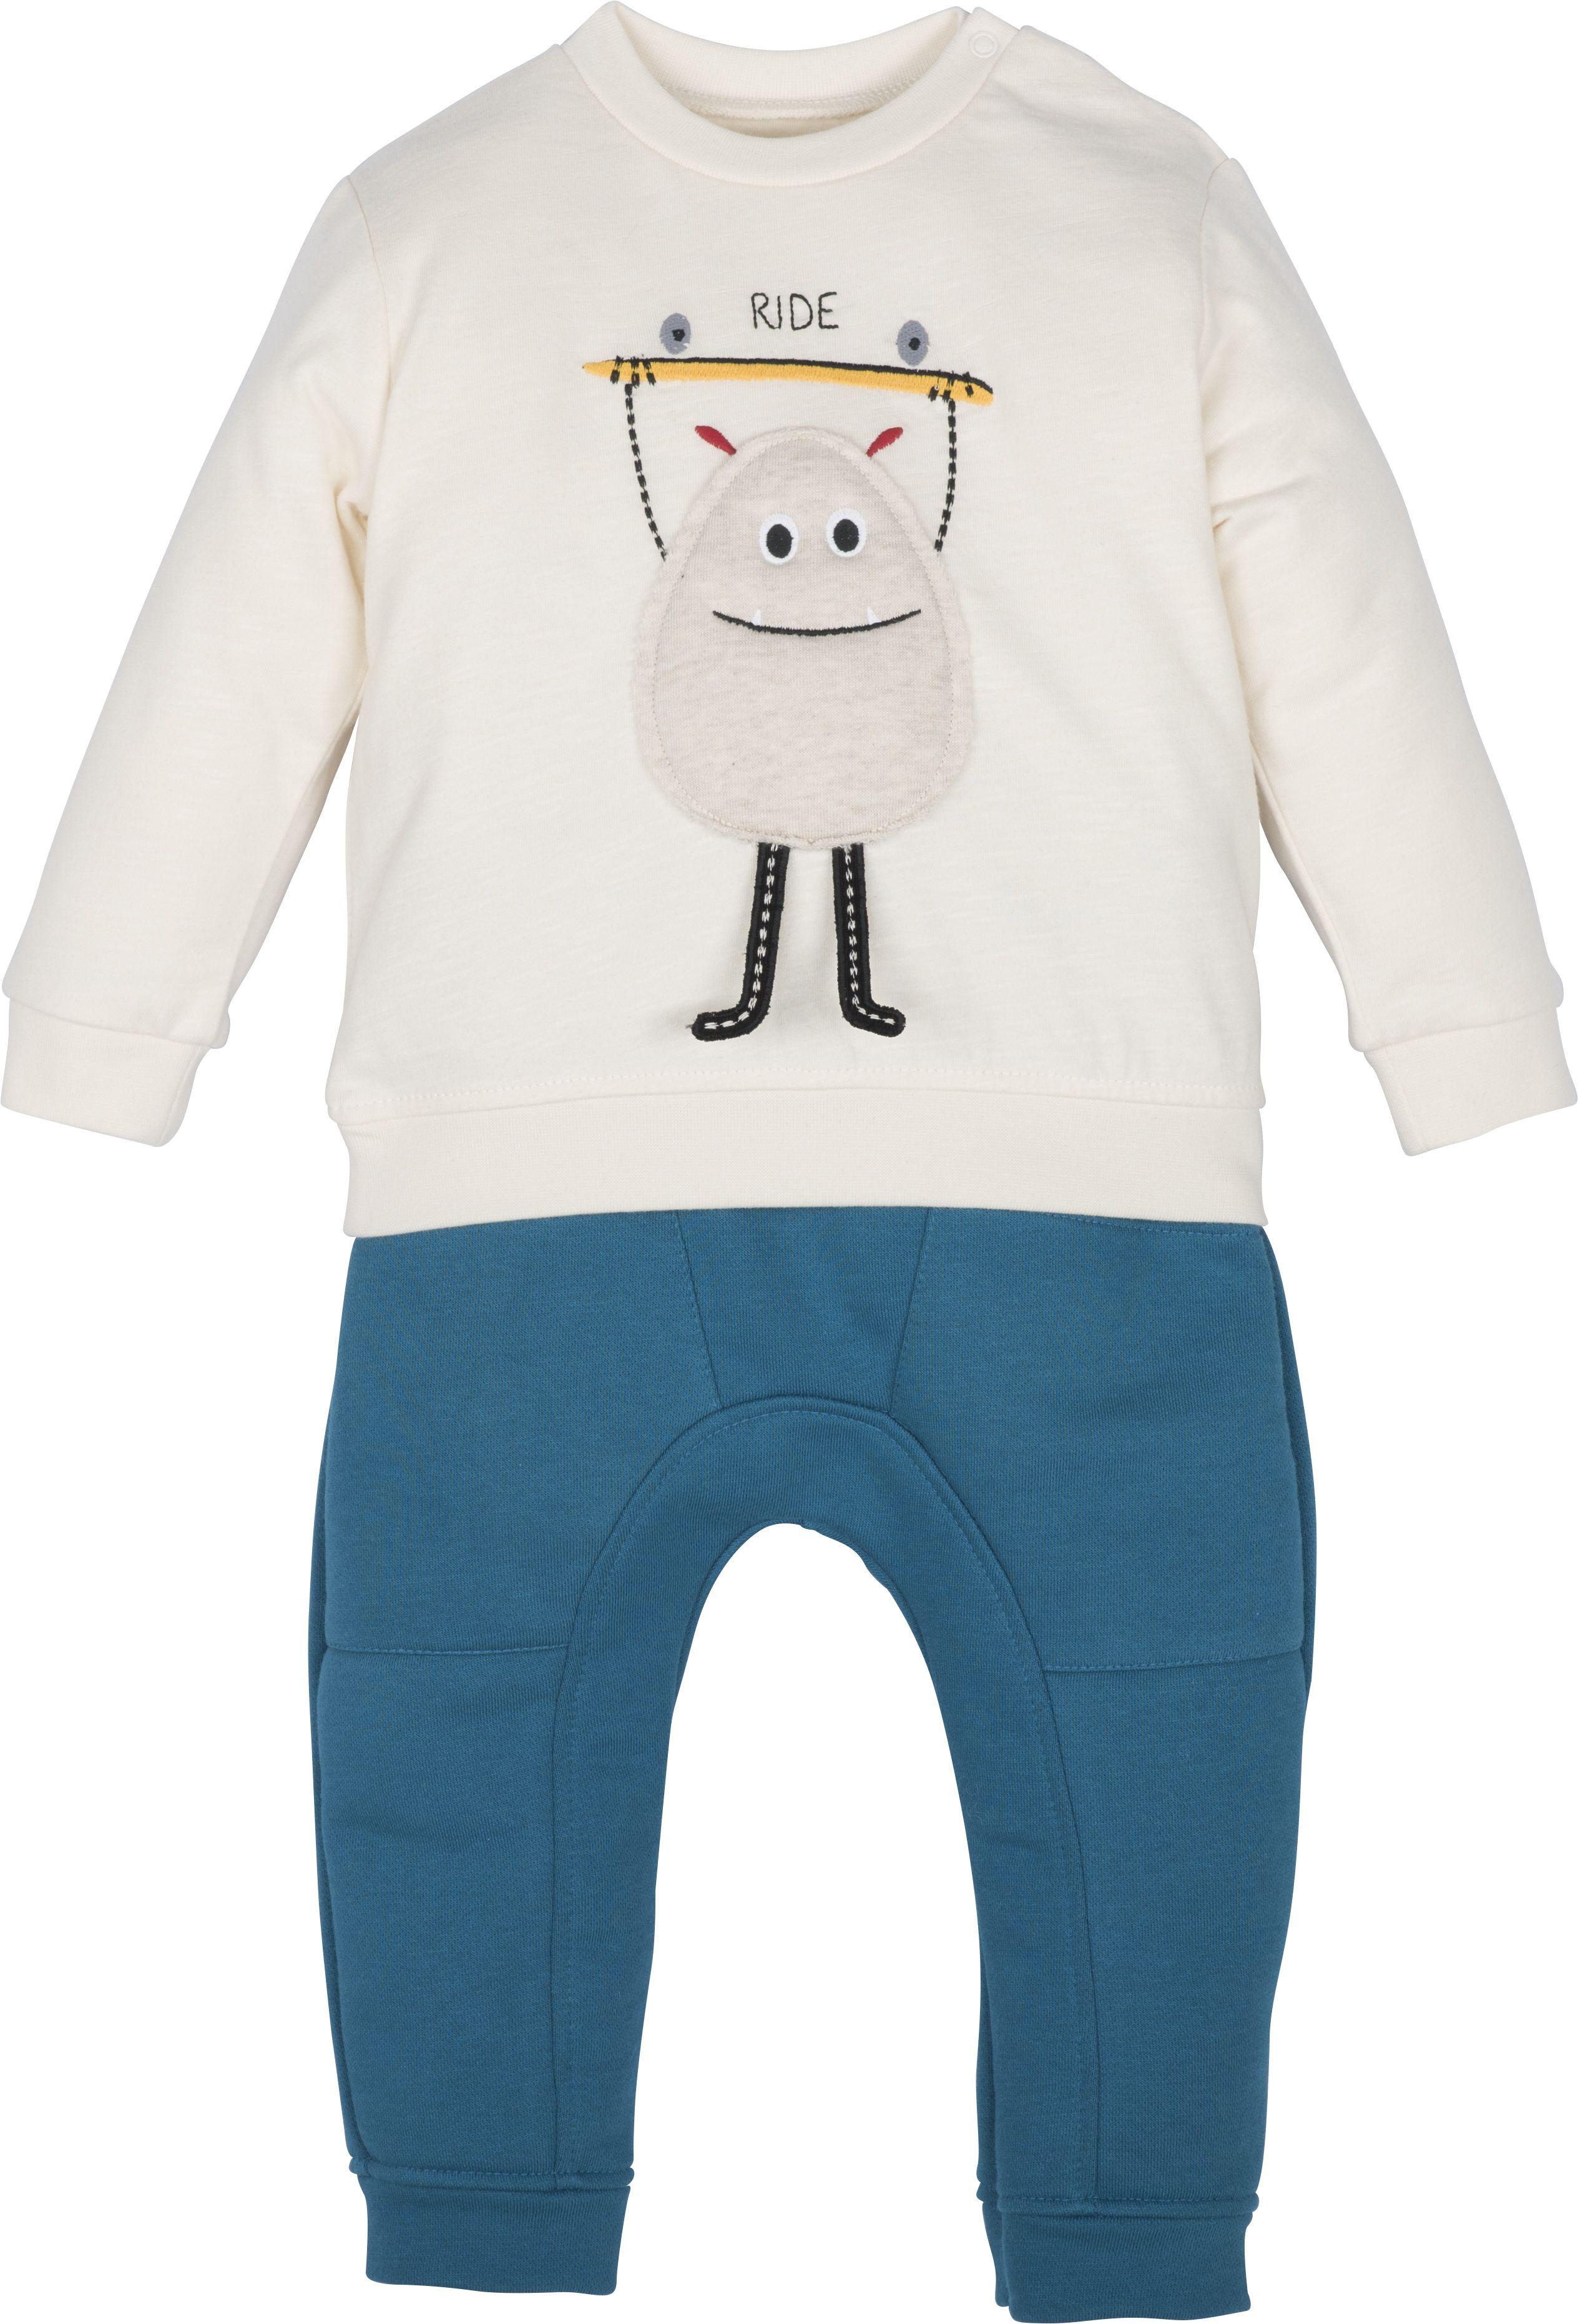 "Set Shirt mit Hose ""Ride"" 💓 #kindermode #kidsfashion #babymode #handmade #baby …"